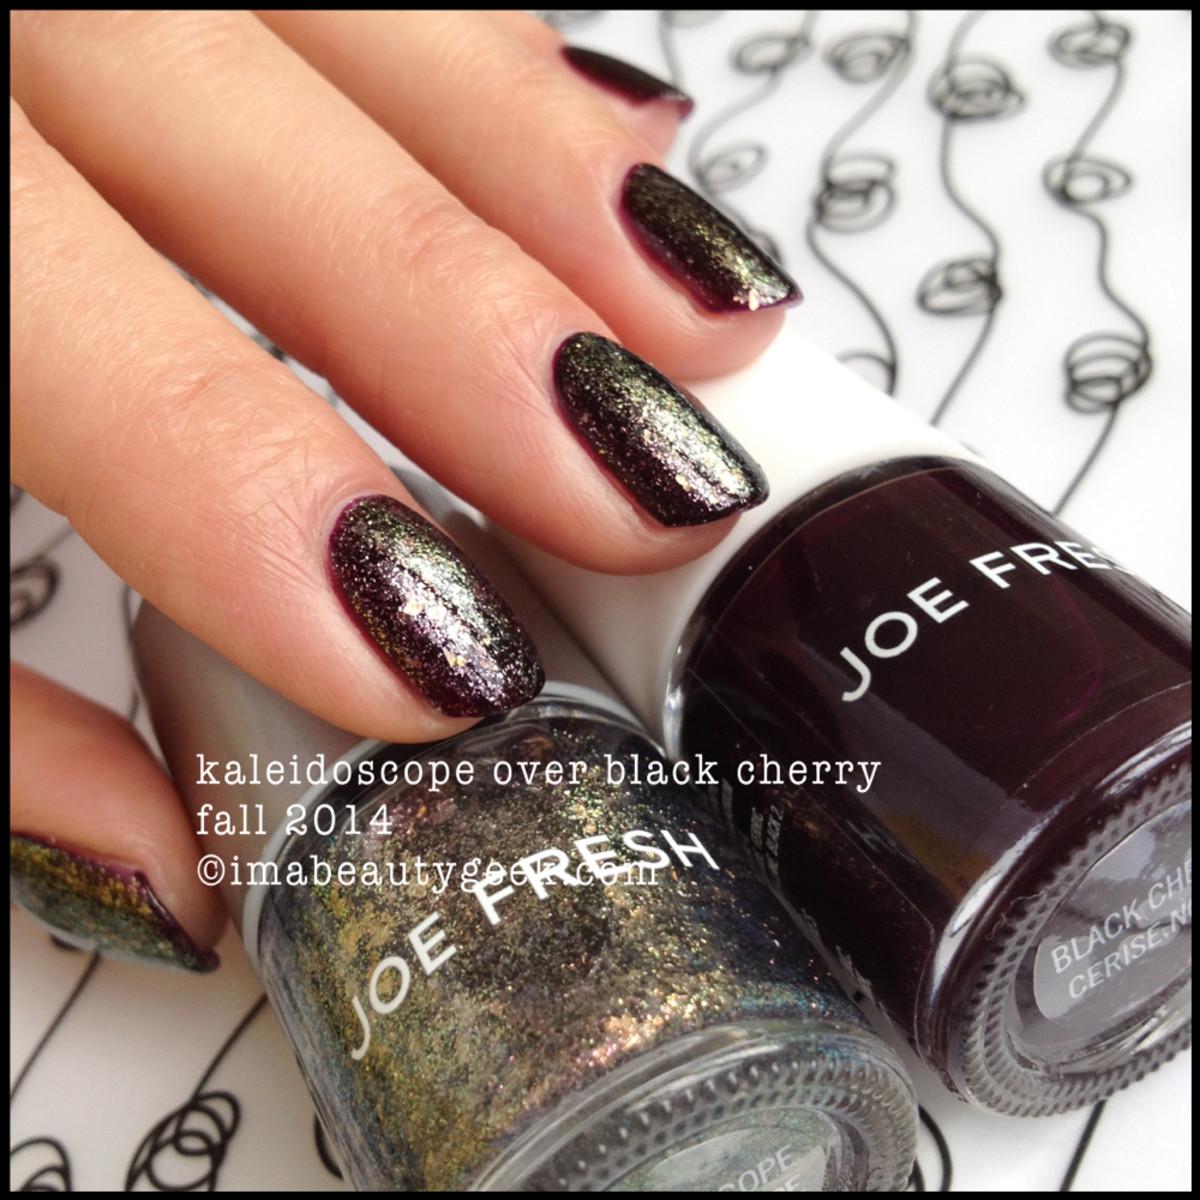 Joe Fresh Polish Kaleidoscope over Black Cherry Fall 2014